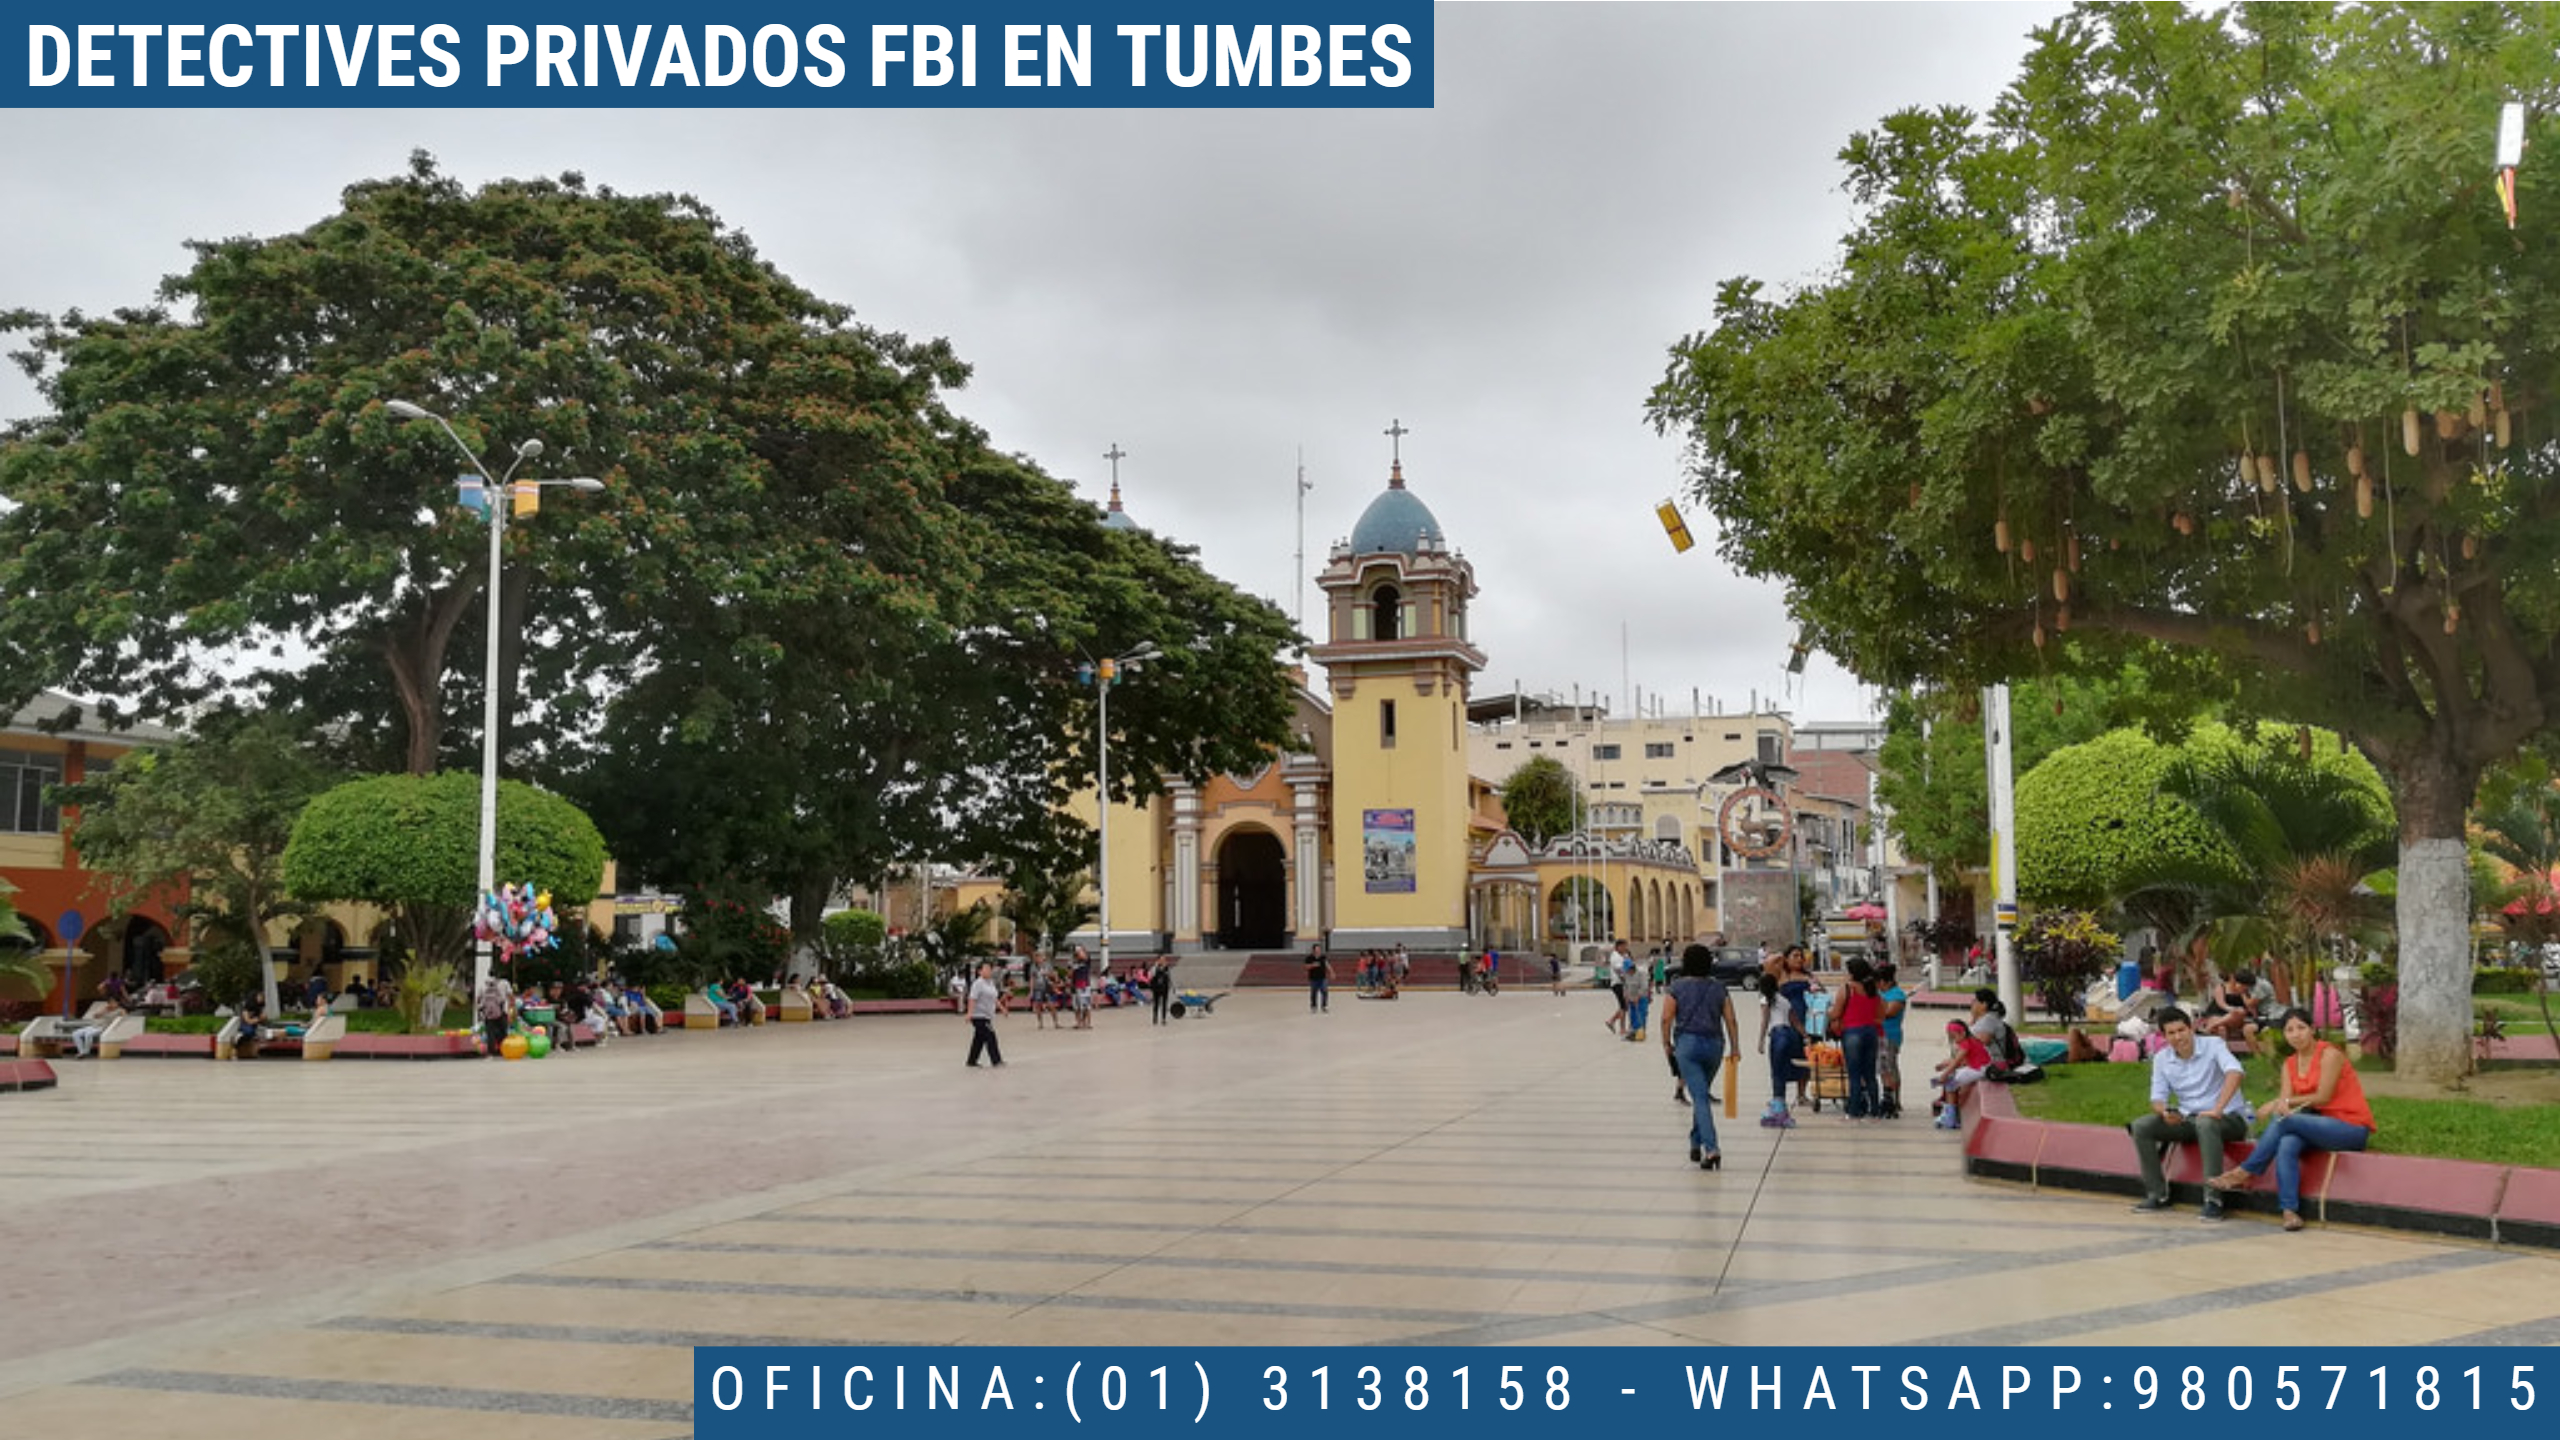 INVESTIGACIÓN PRIVADA FBI EN TUMBES - PERU